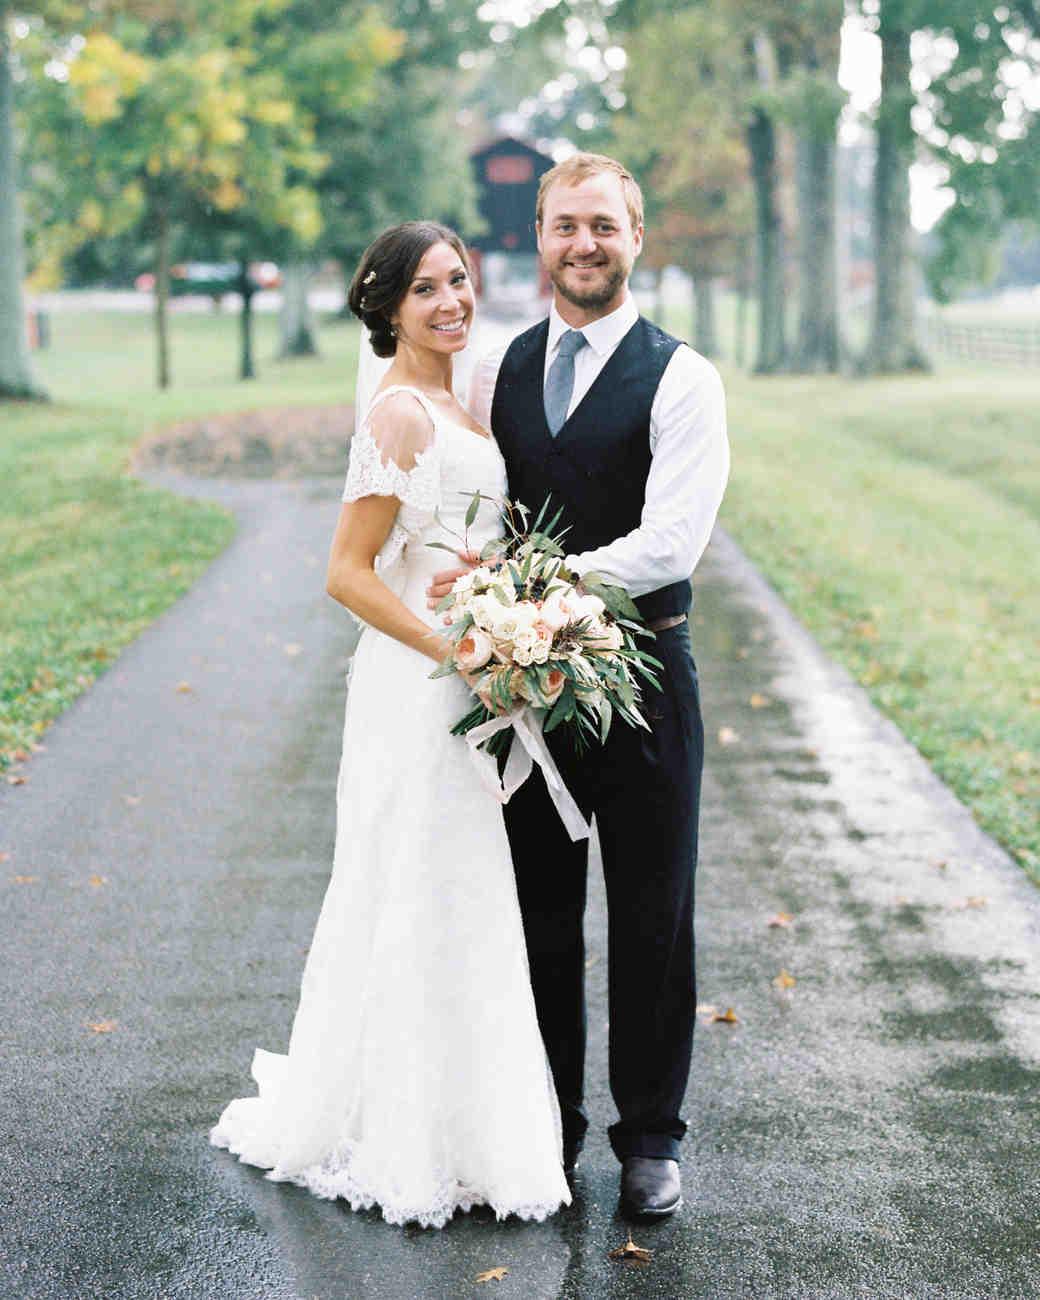 Jennifer lahmers wedding